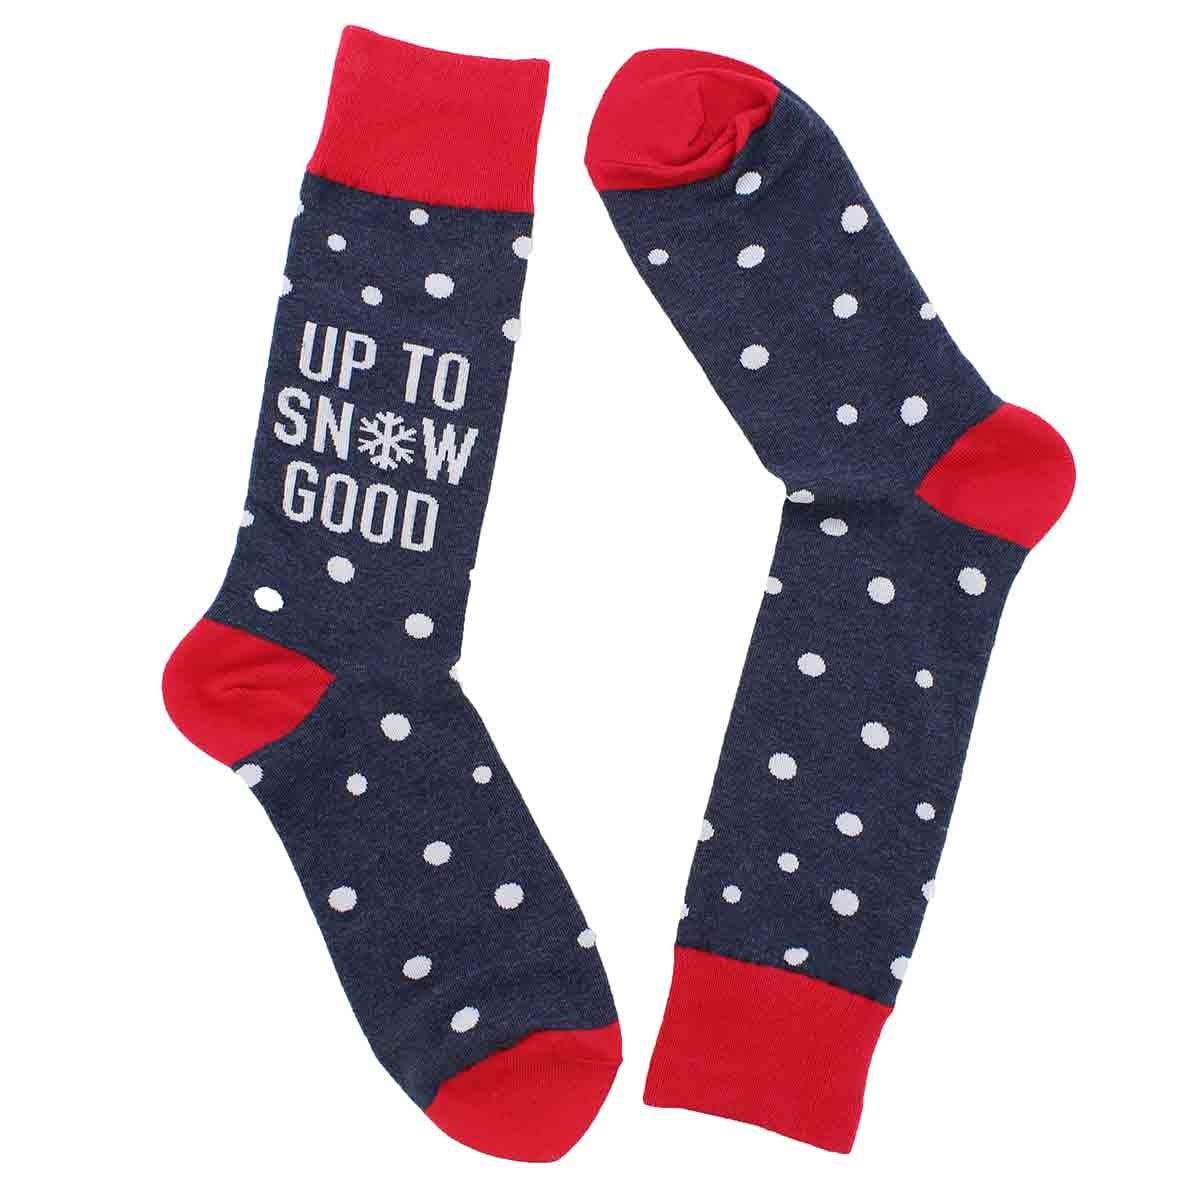 Men's Up To Snow Good Sock - Grey Printed